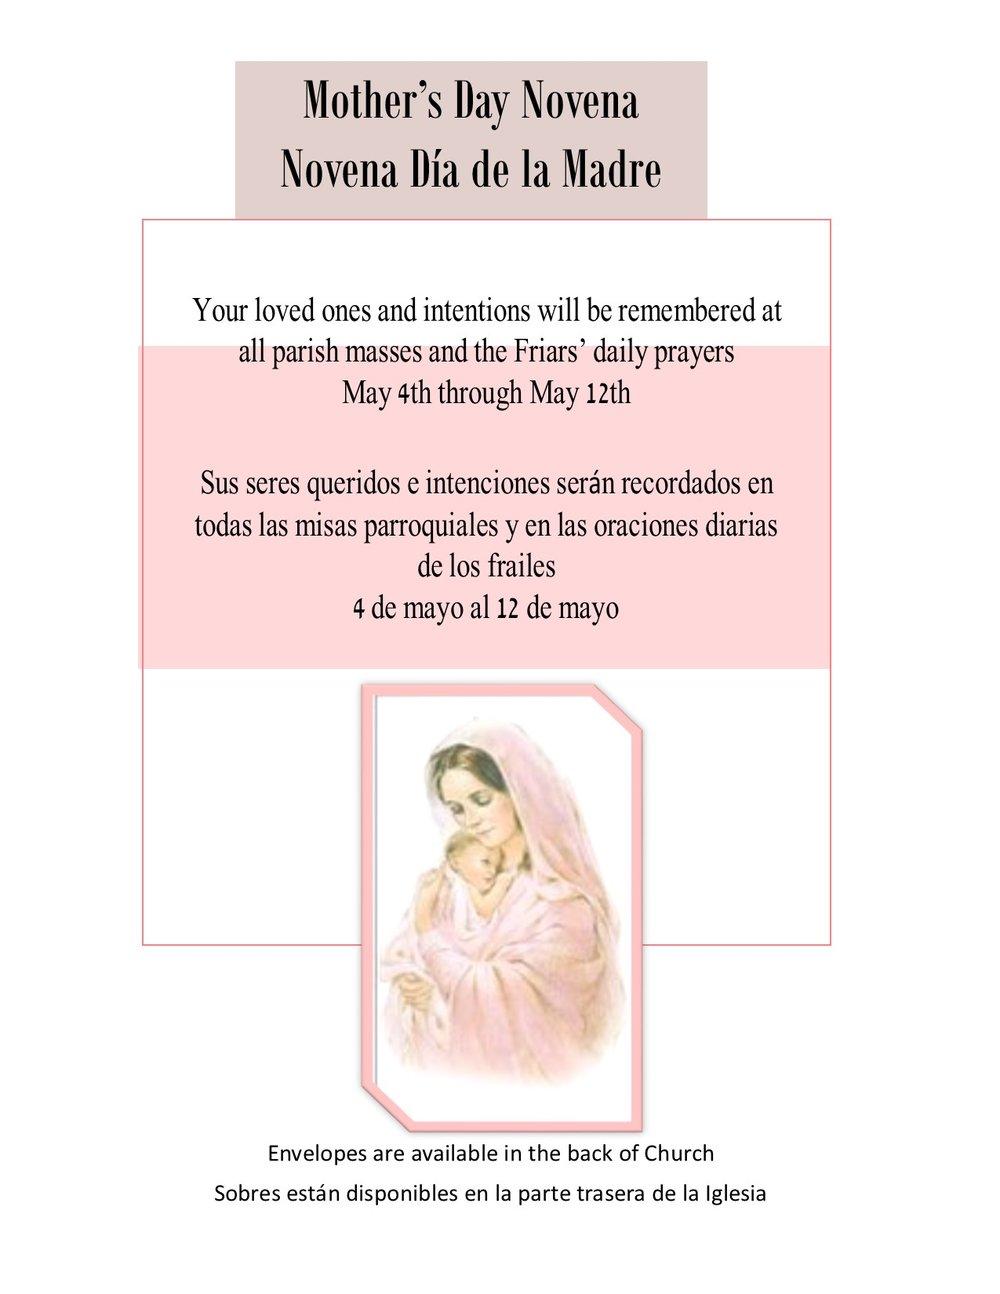 Mother's Day Novena 2019.jpg